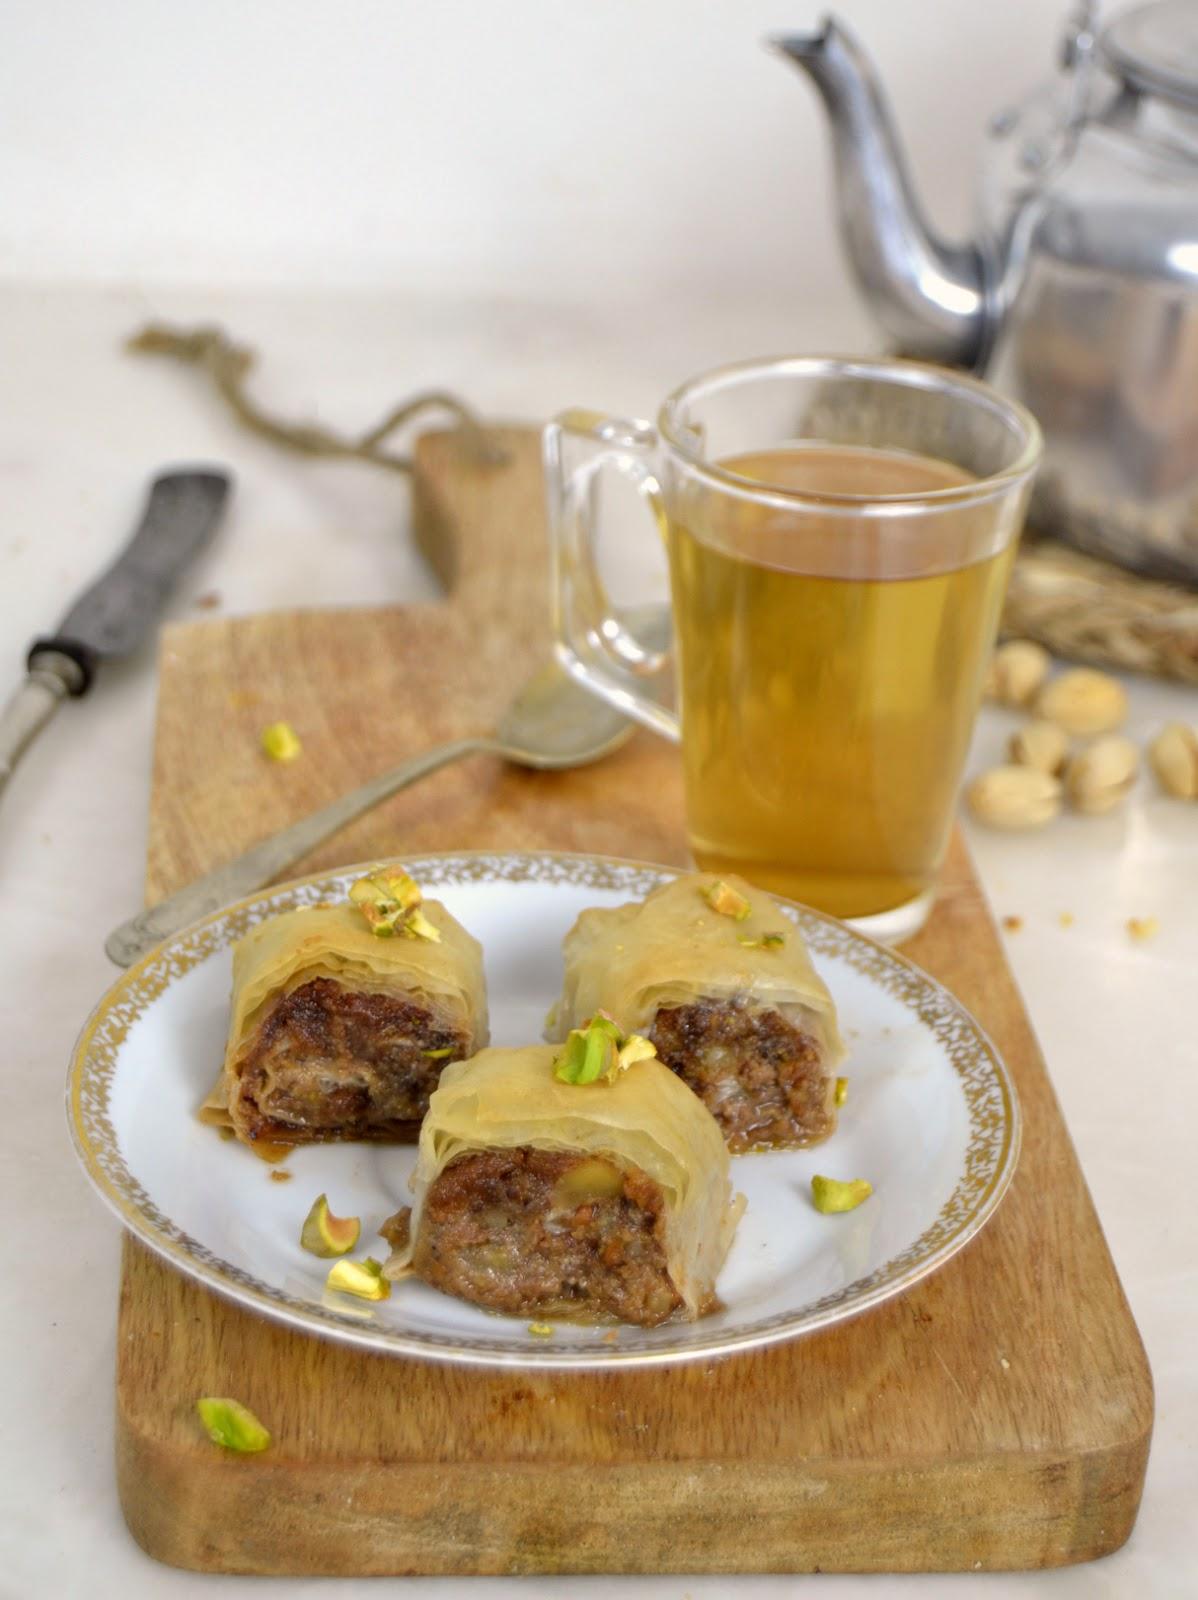 Pastelitos árabes de frutos secos